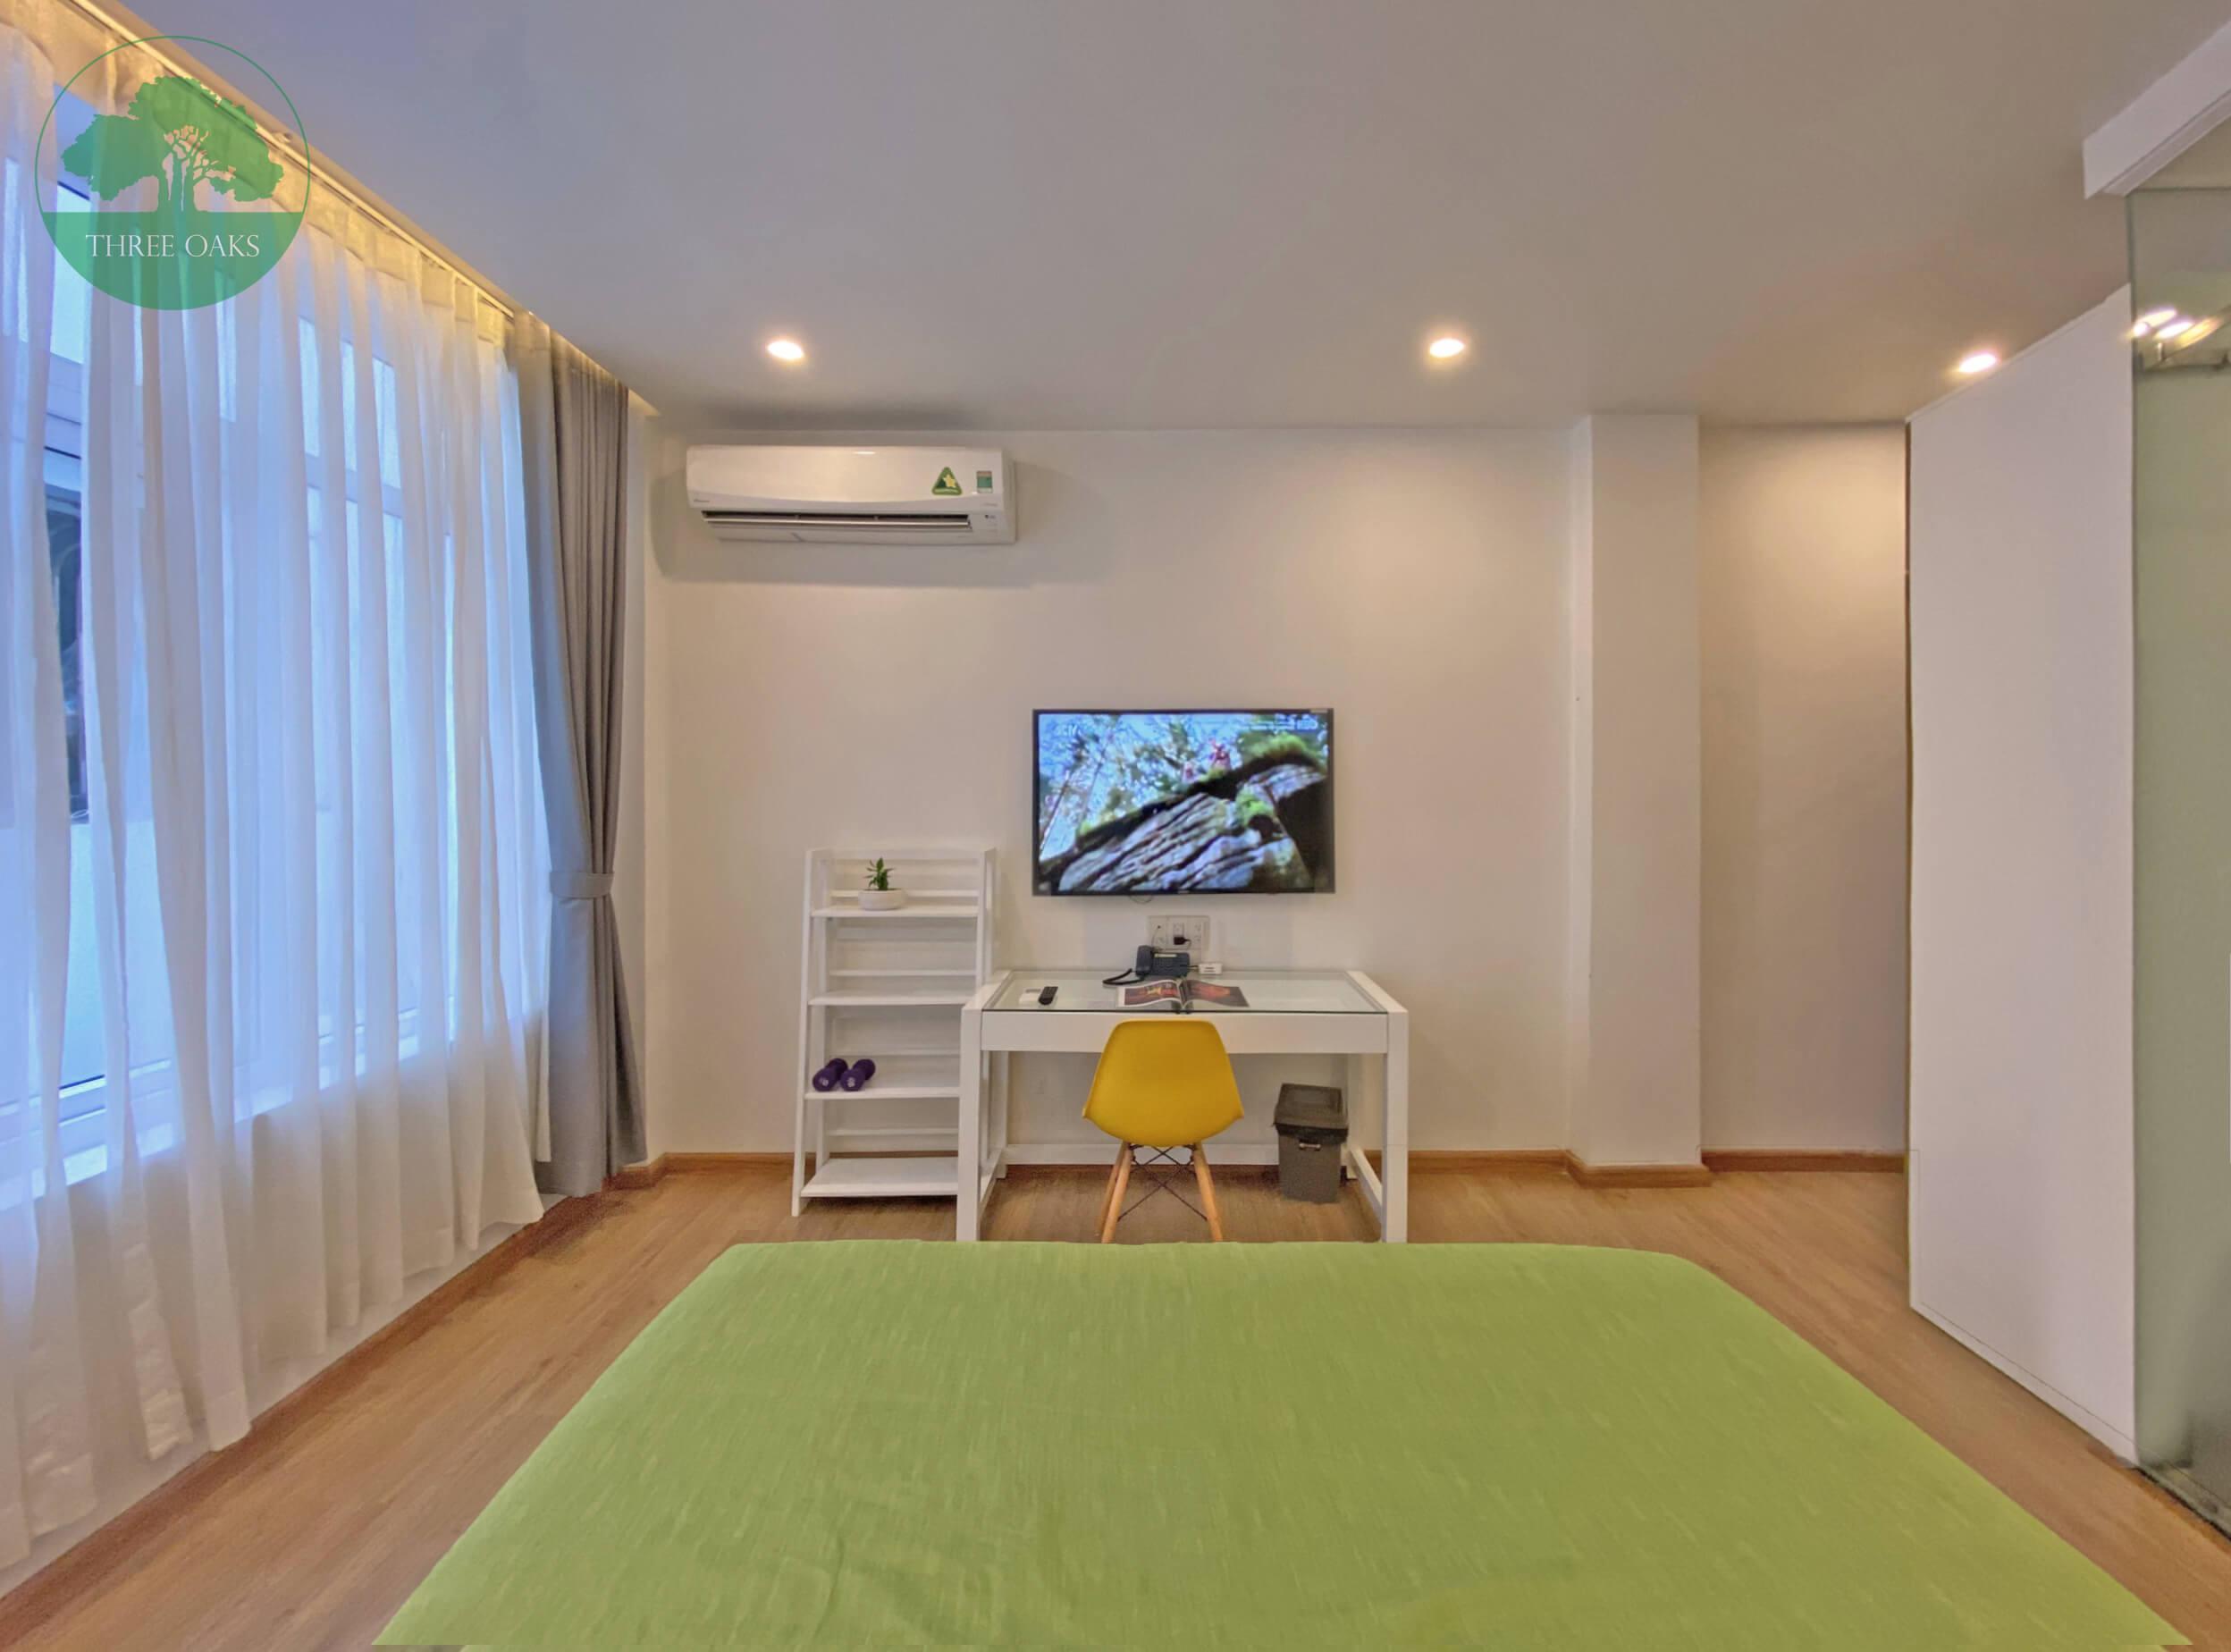 serviced-aparment-room-for-rent-saigon-one-bedroom-superior-1